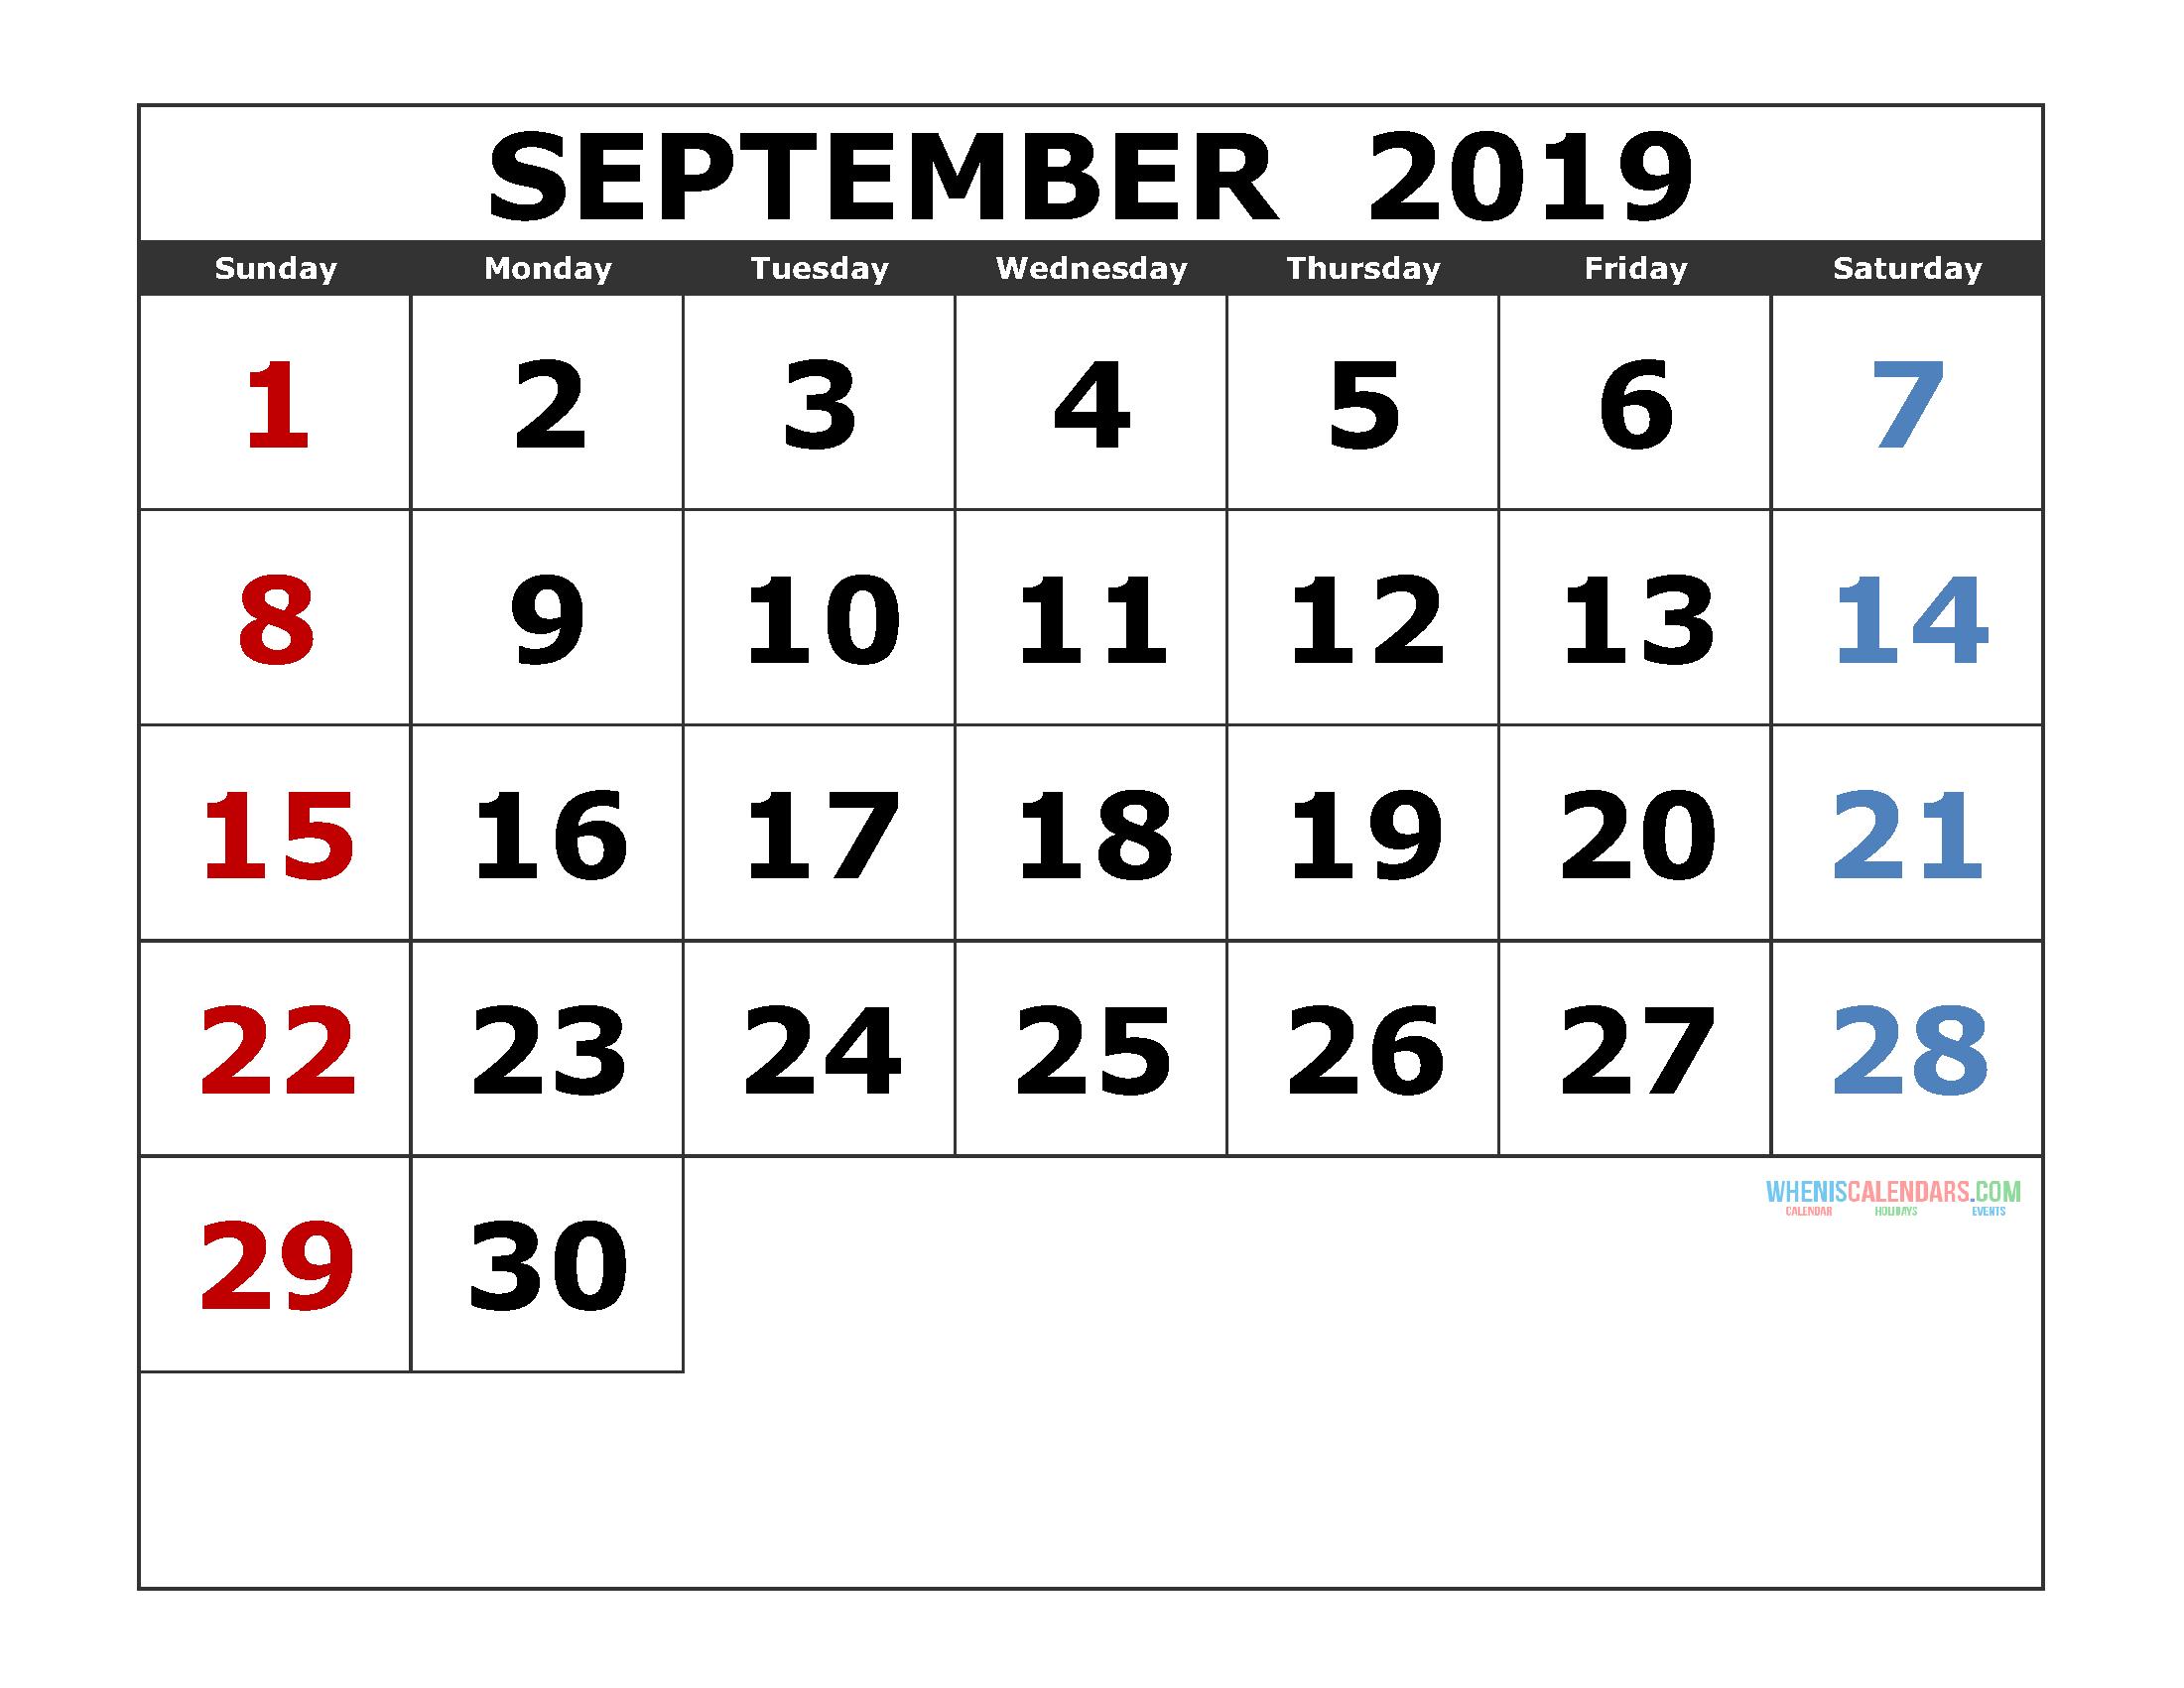 September 2019 Printable Calendar Template Excel, PDF, Image